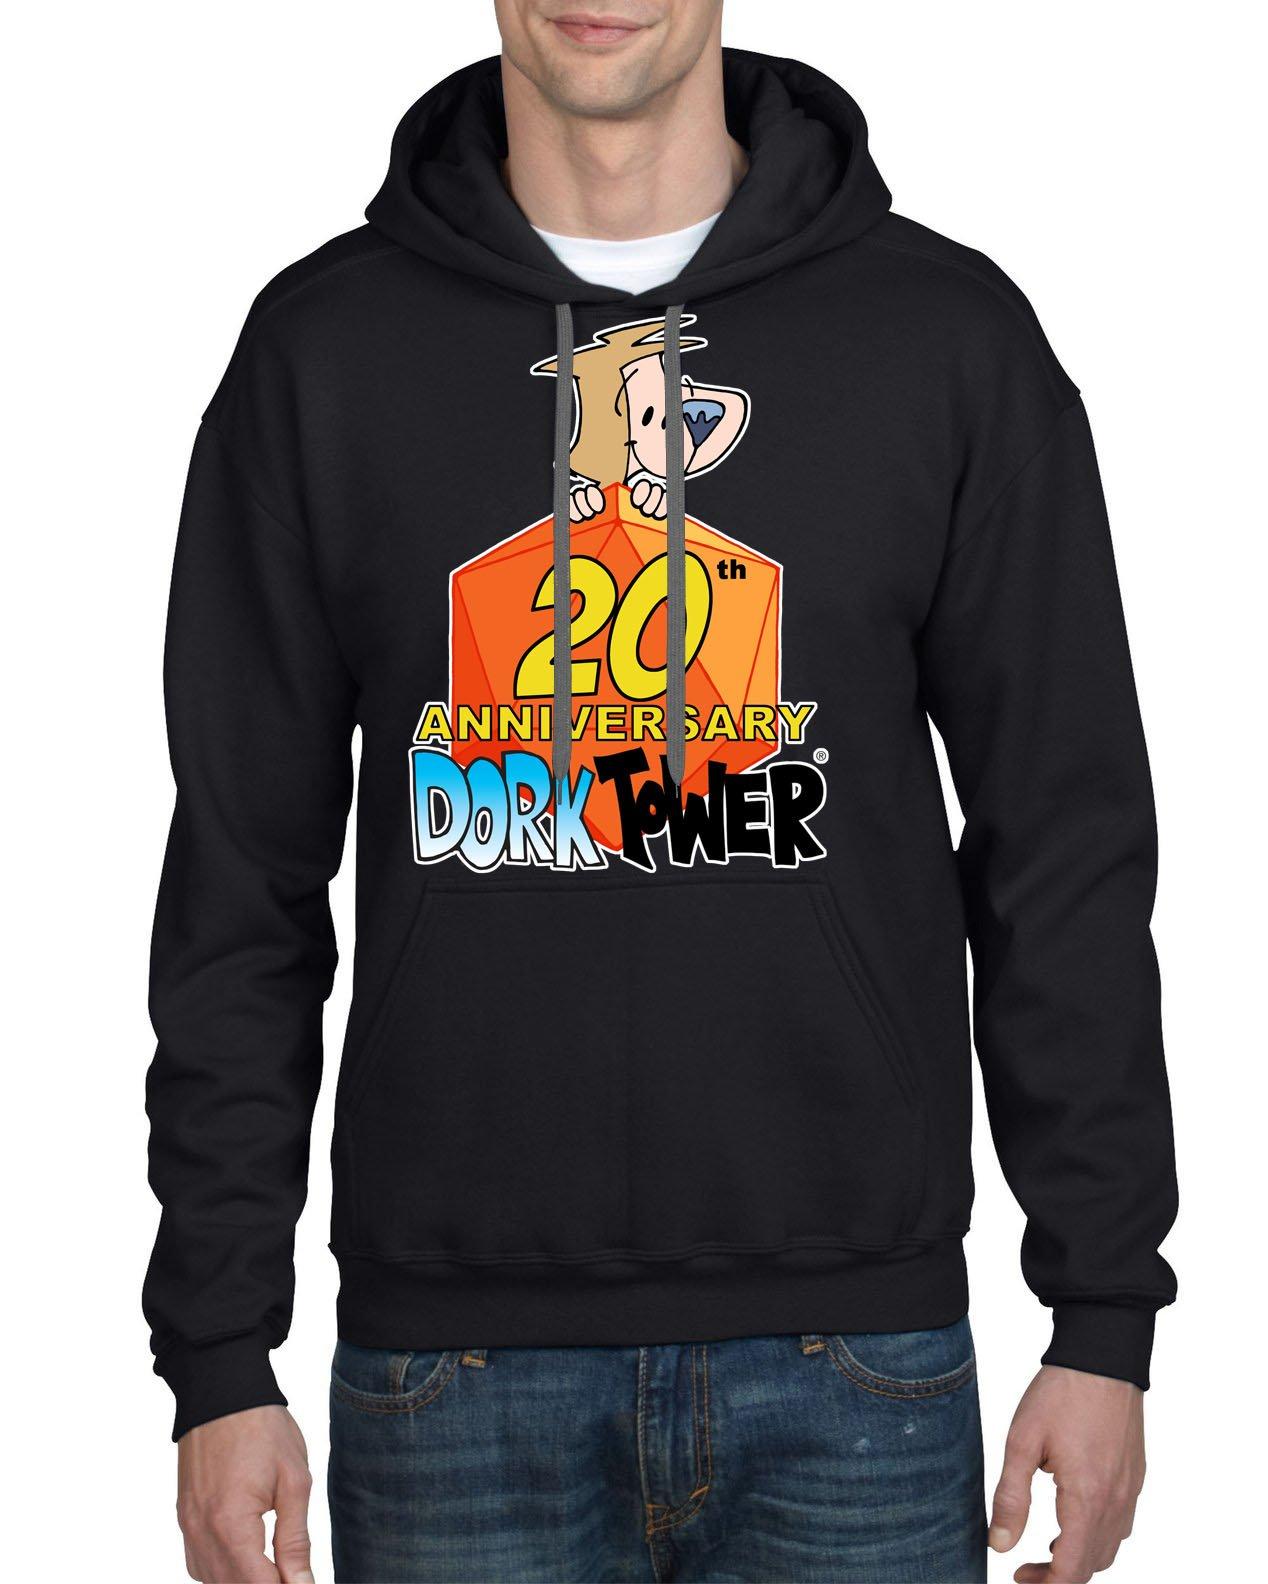 Image of Dork Tower 20th Anniversary Hoodie